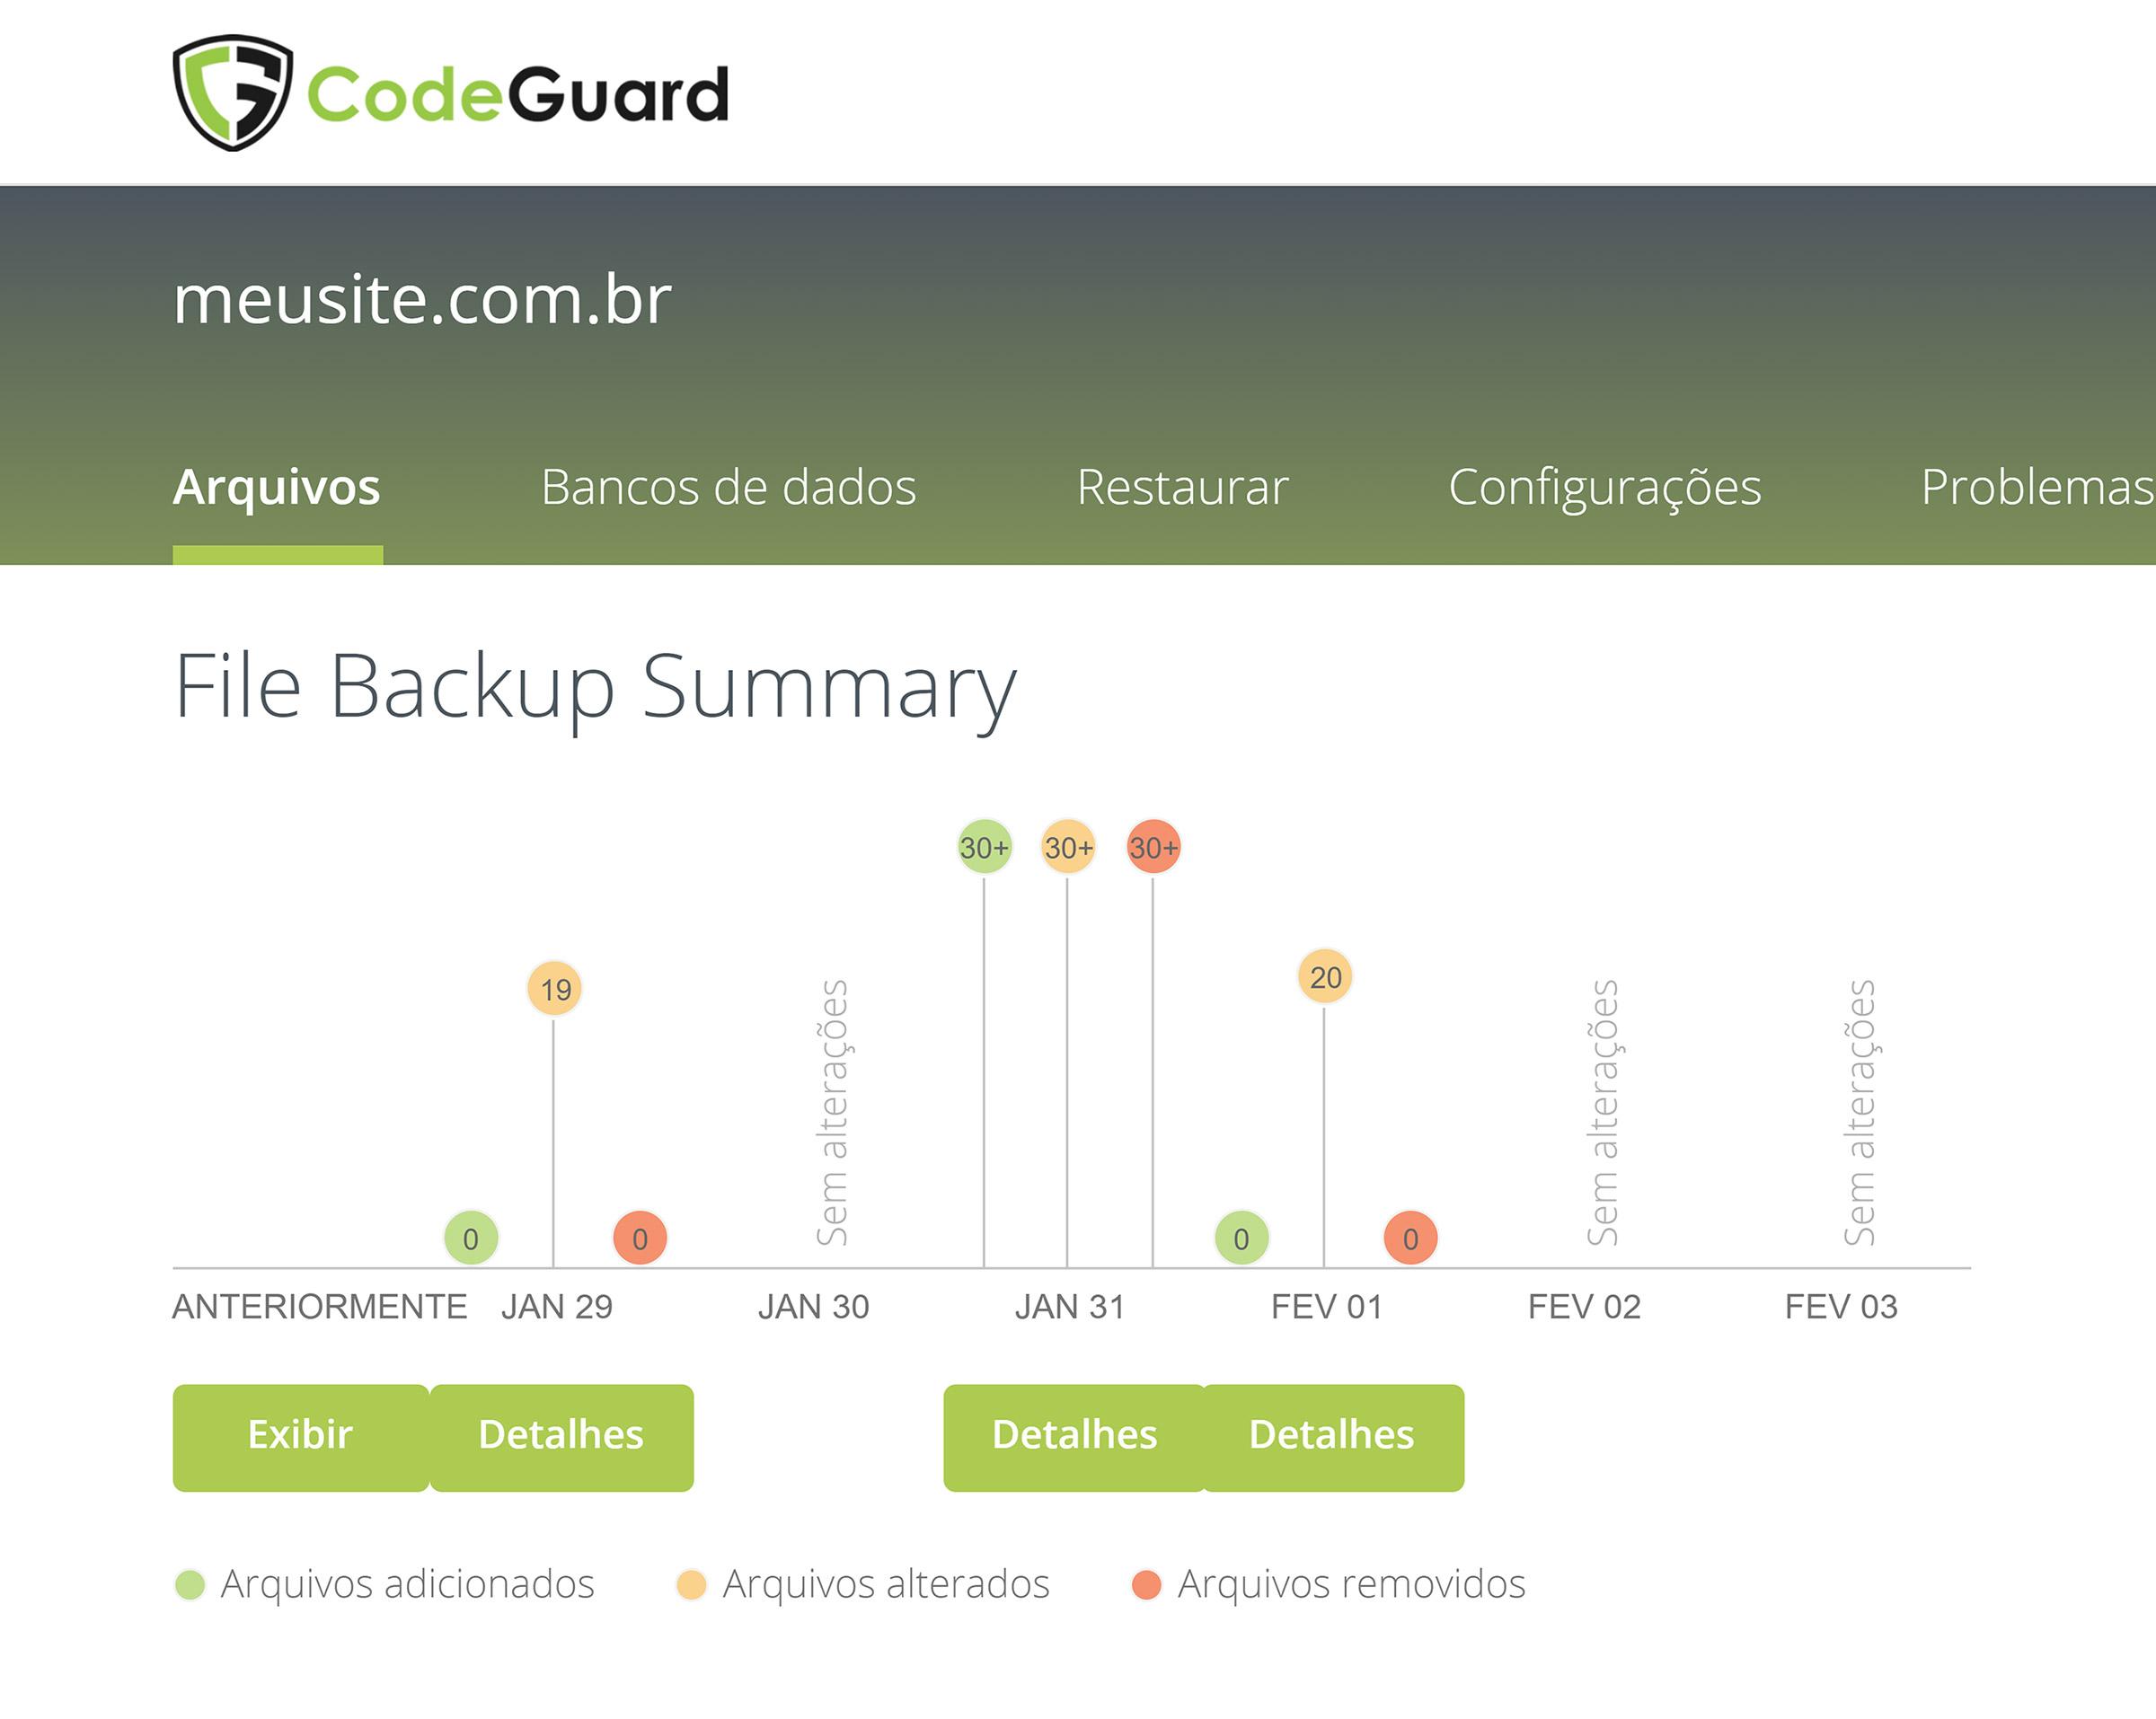 codeguard arquivos modificados painel